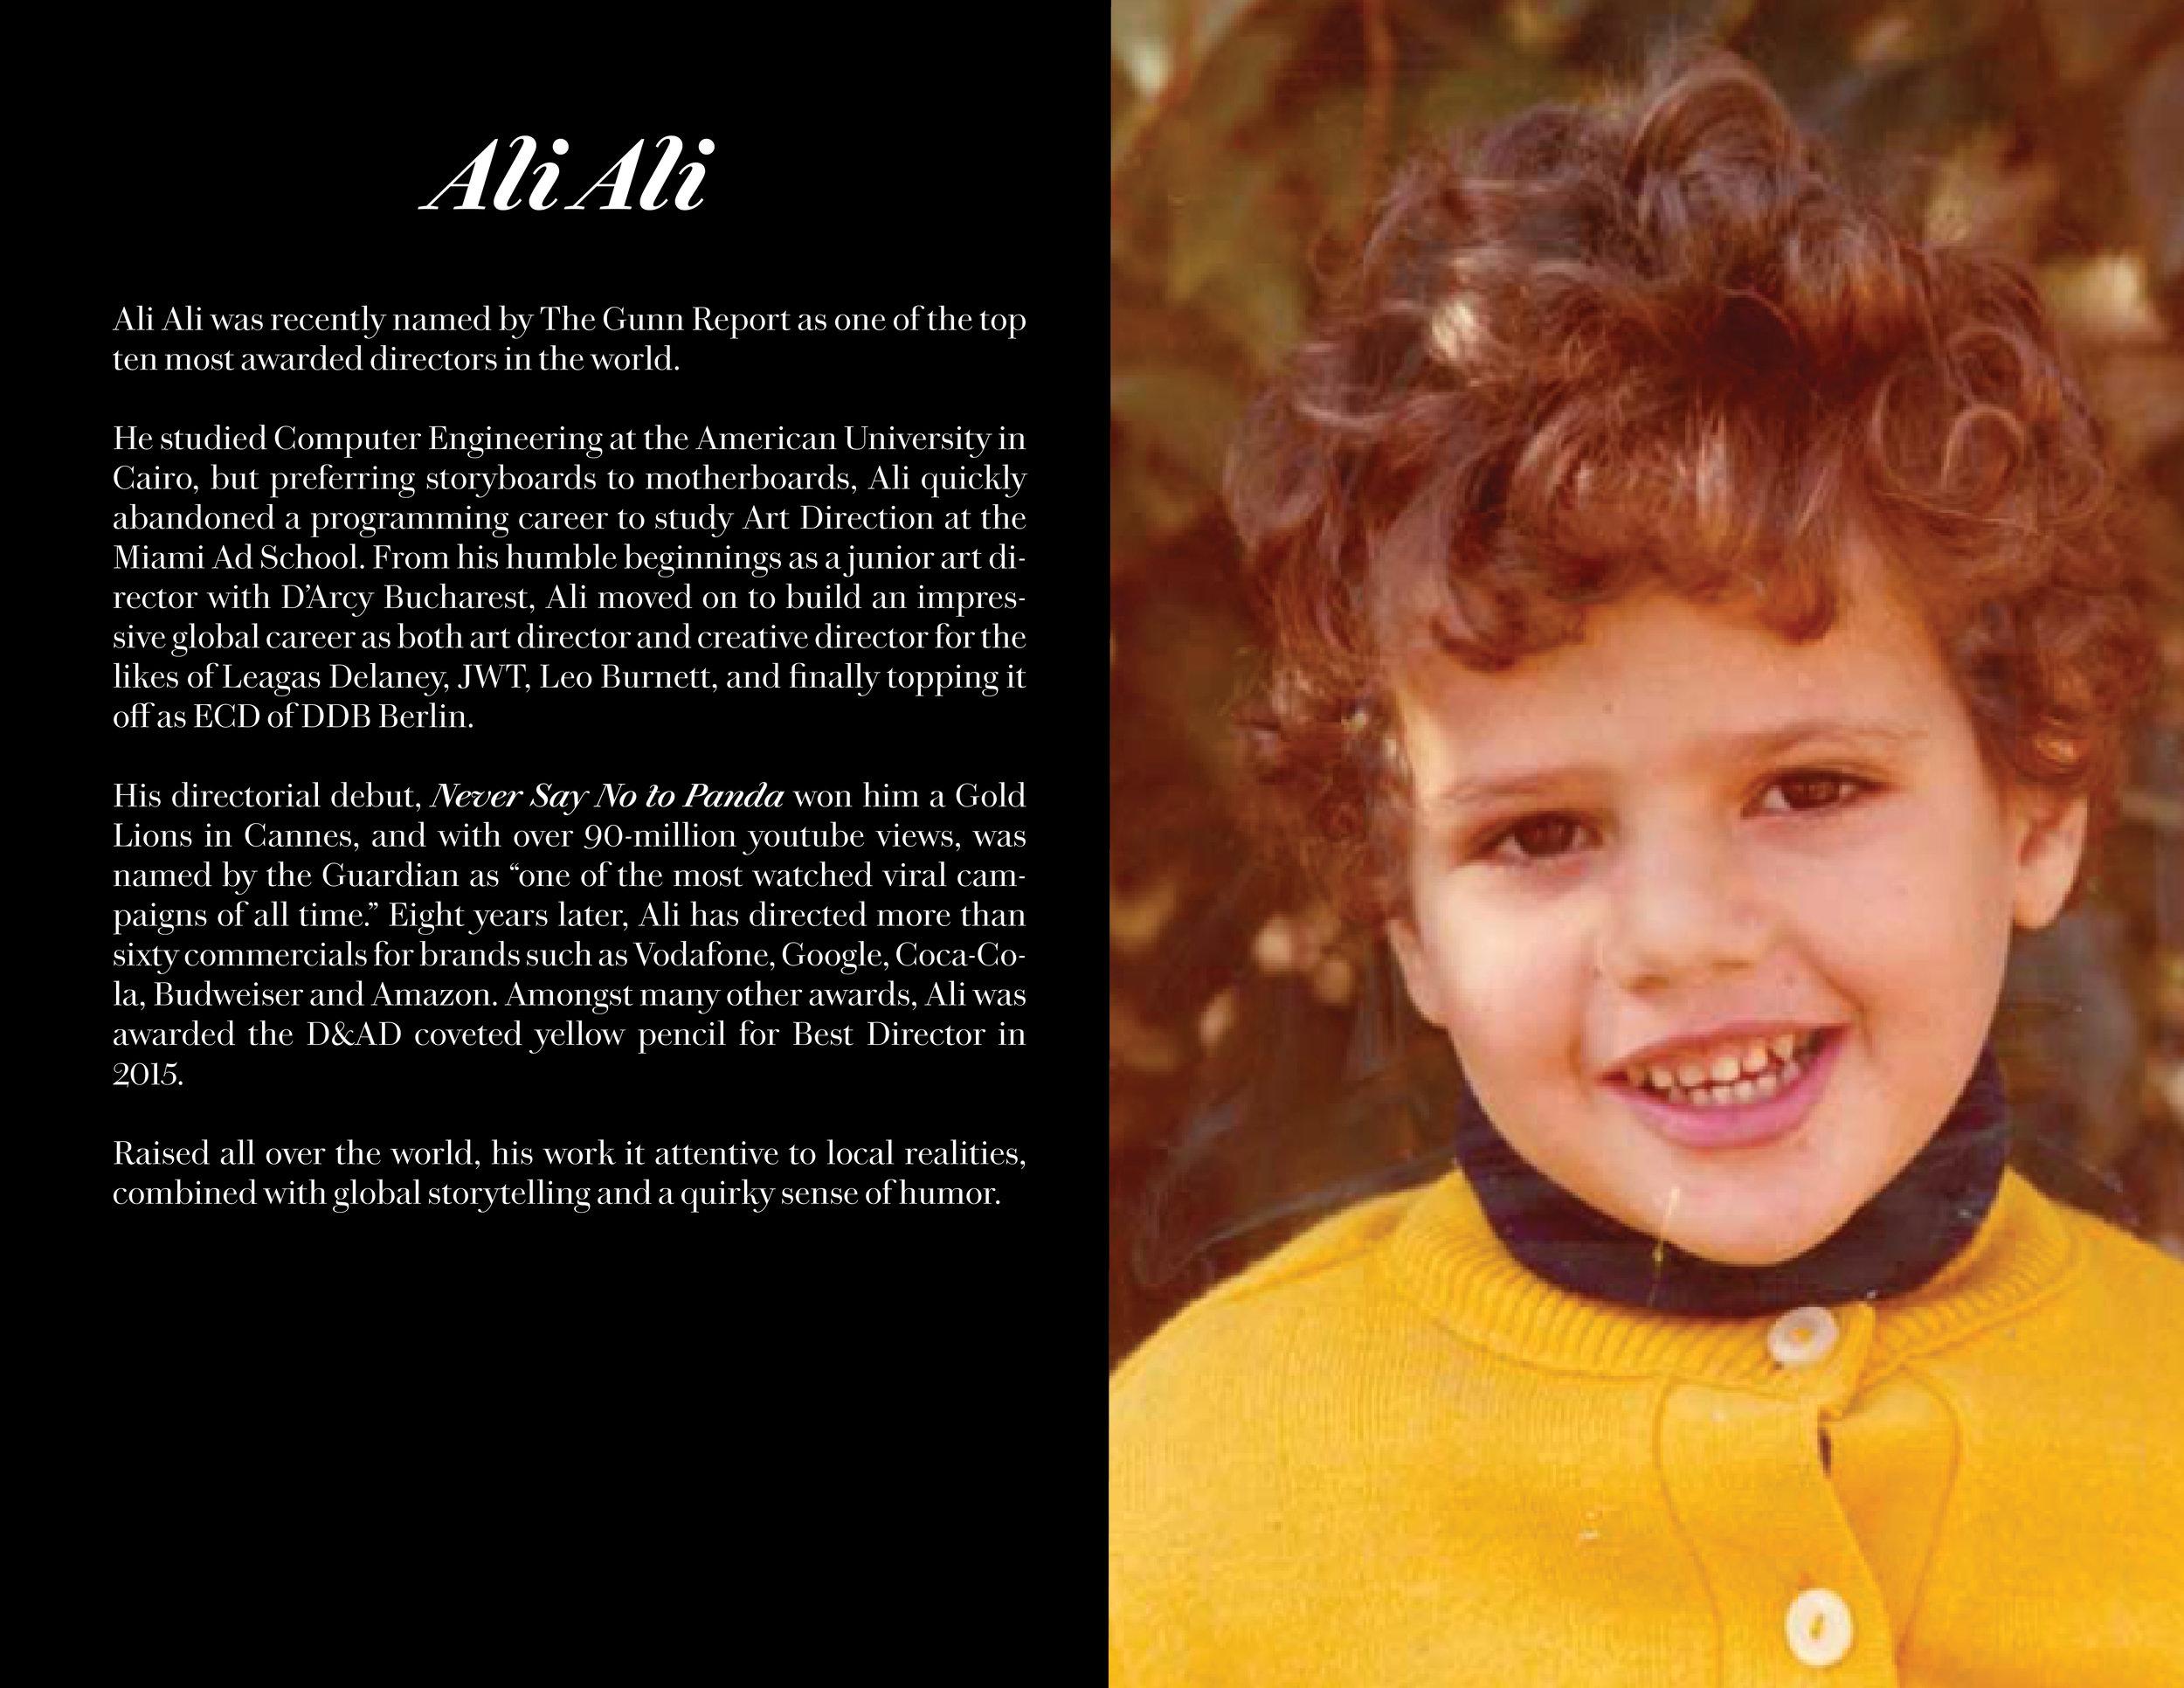 Ali Ali Bio 03_01_19 FOR WESBITE v2.jpg